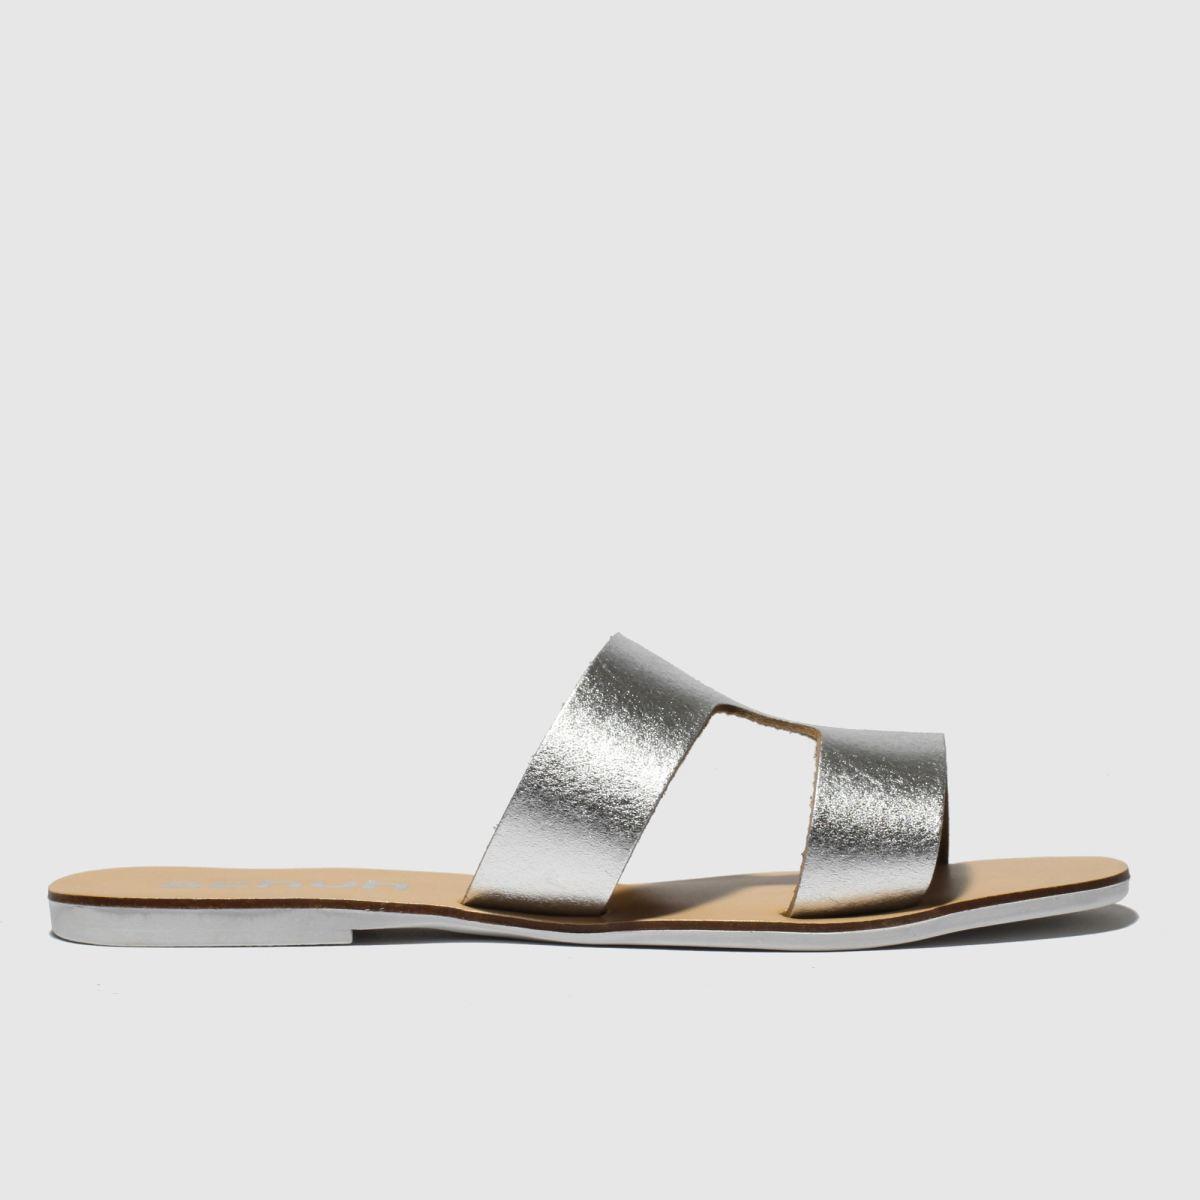 518d309a7a7b5 Schuh Silver Mallorca Sandals